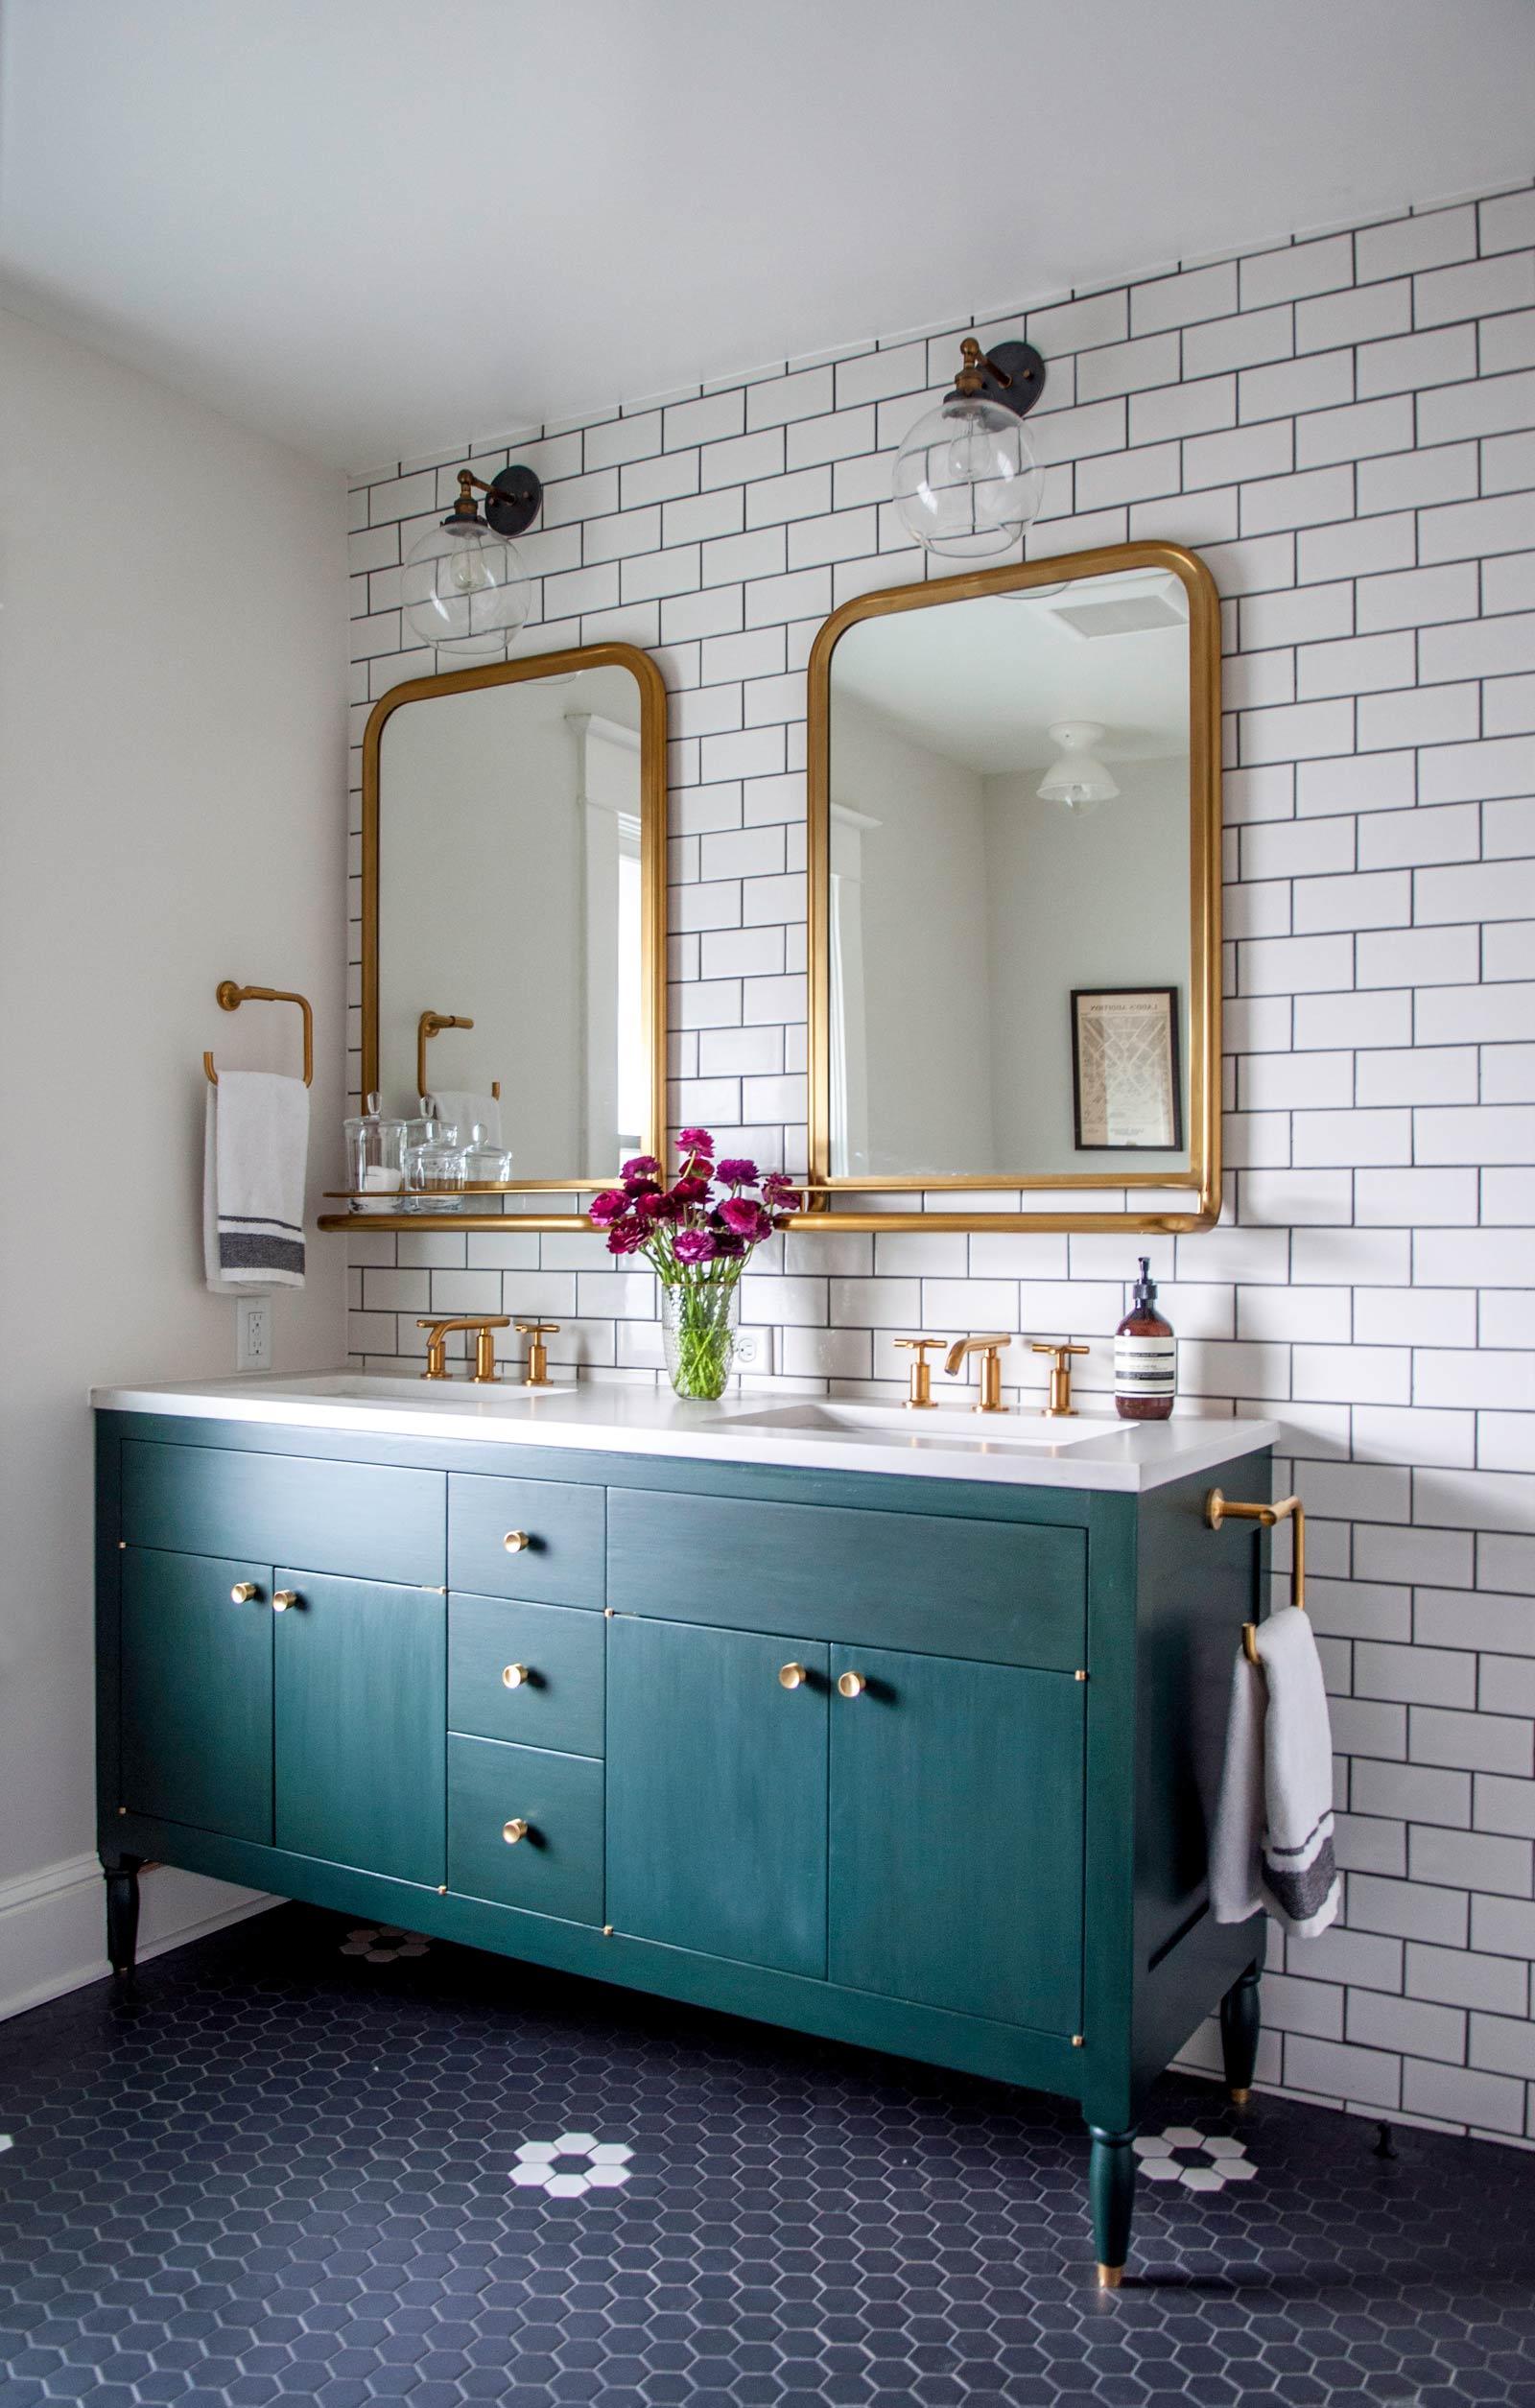 Remodelaholic friday favorites marbling wallpaper and - Schoolhouse bathroom vanity light ...